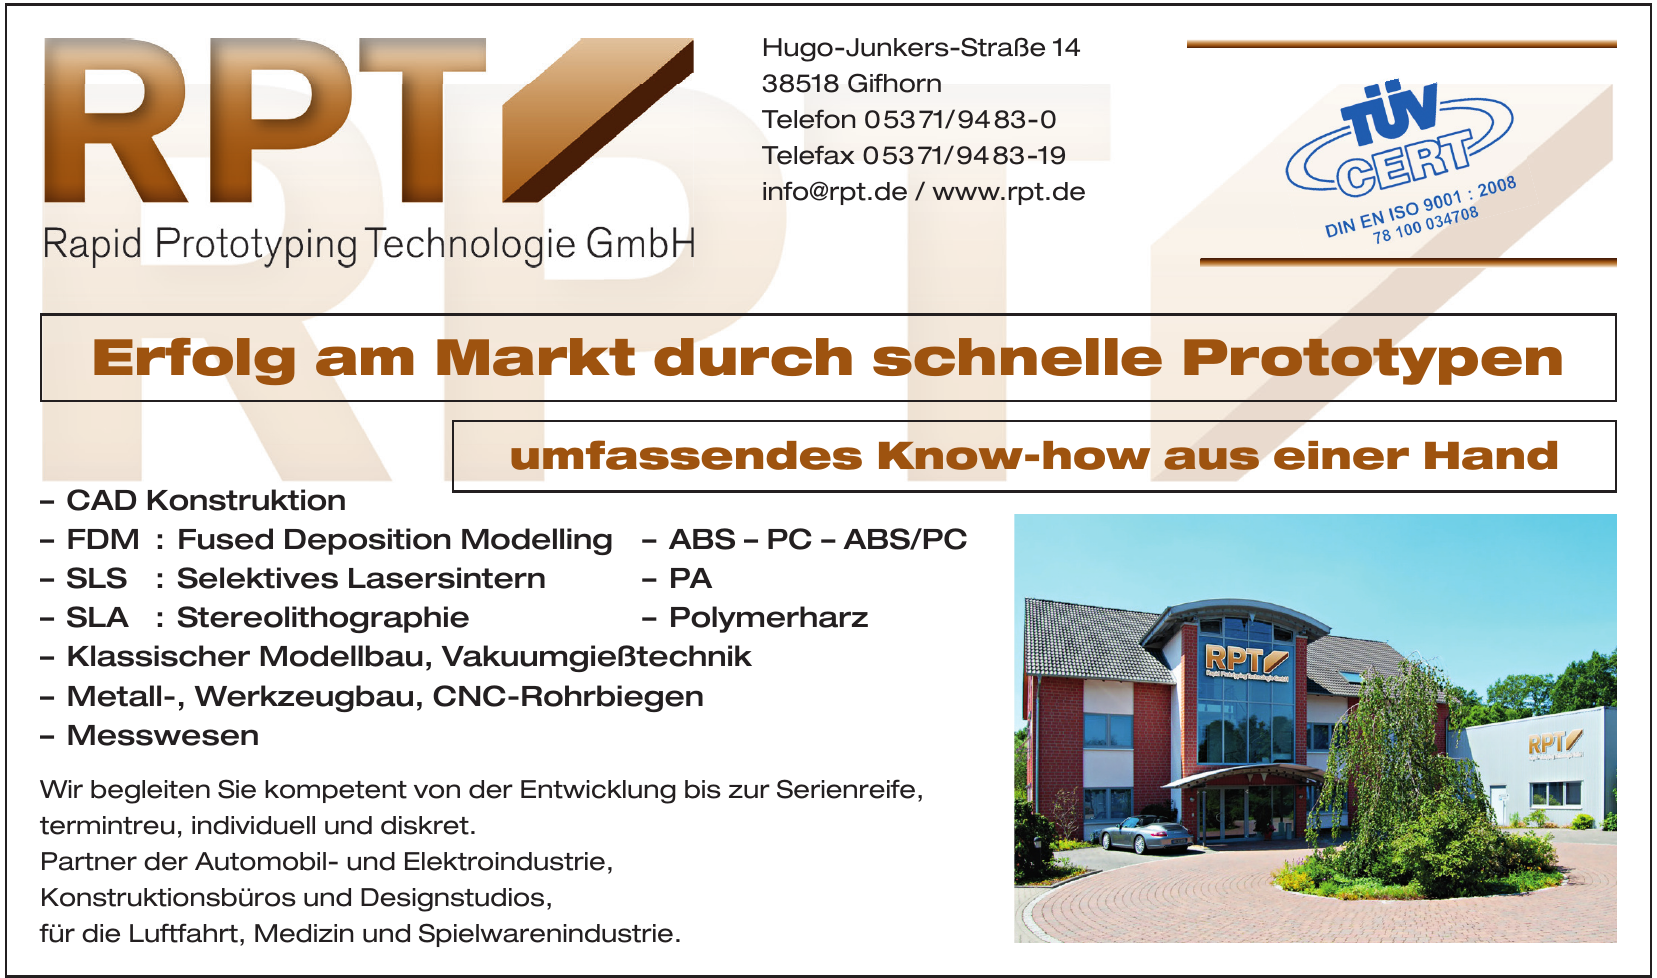 Rapid Prototyp Technologie GmbH